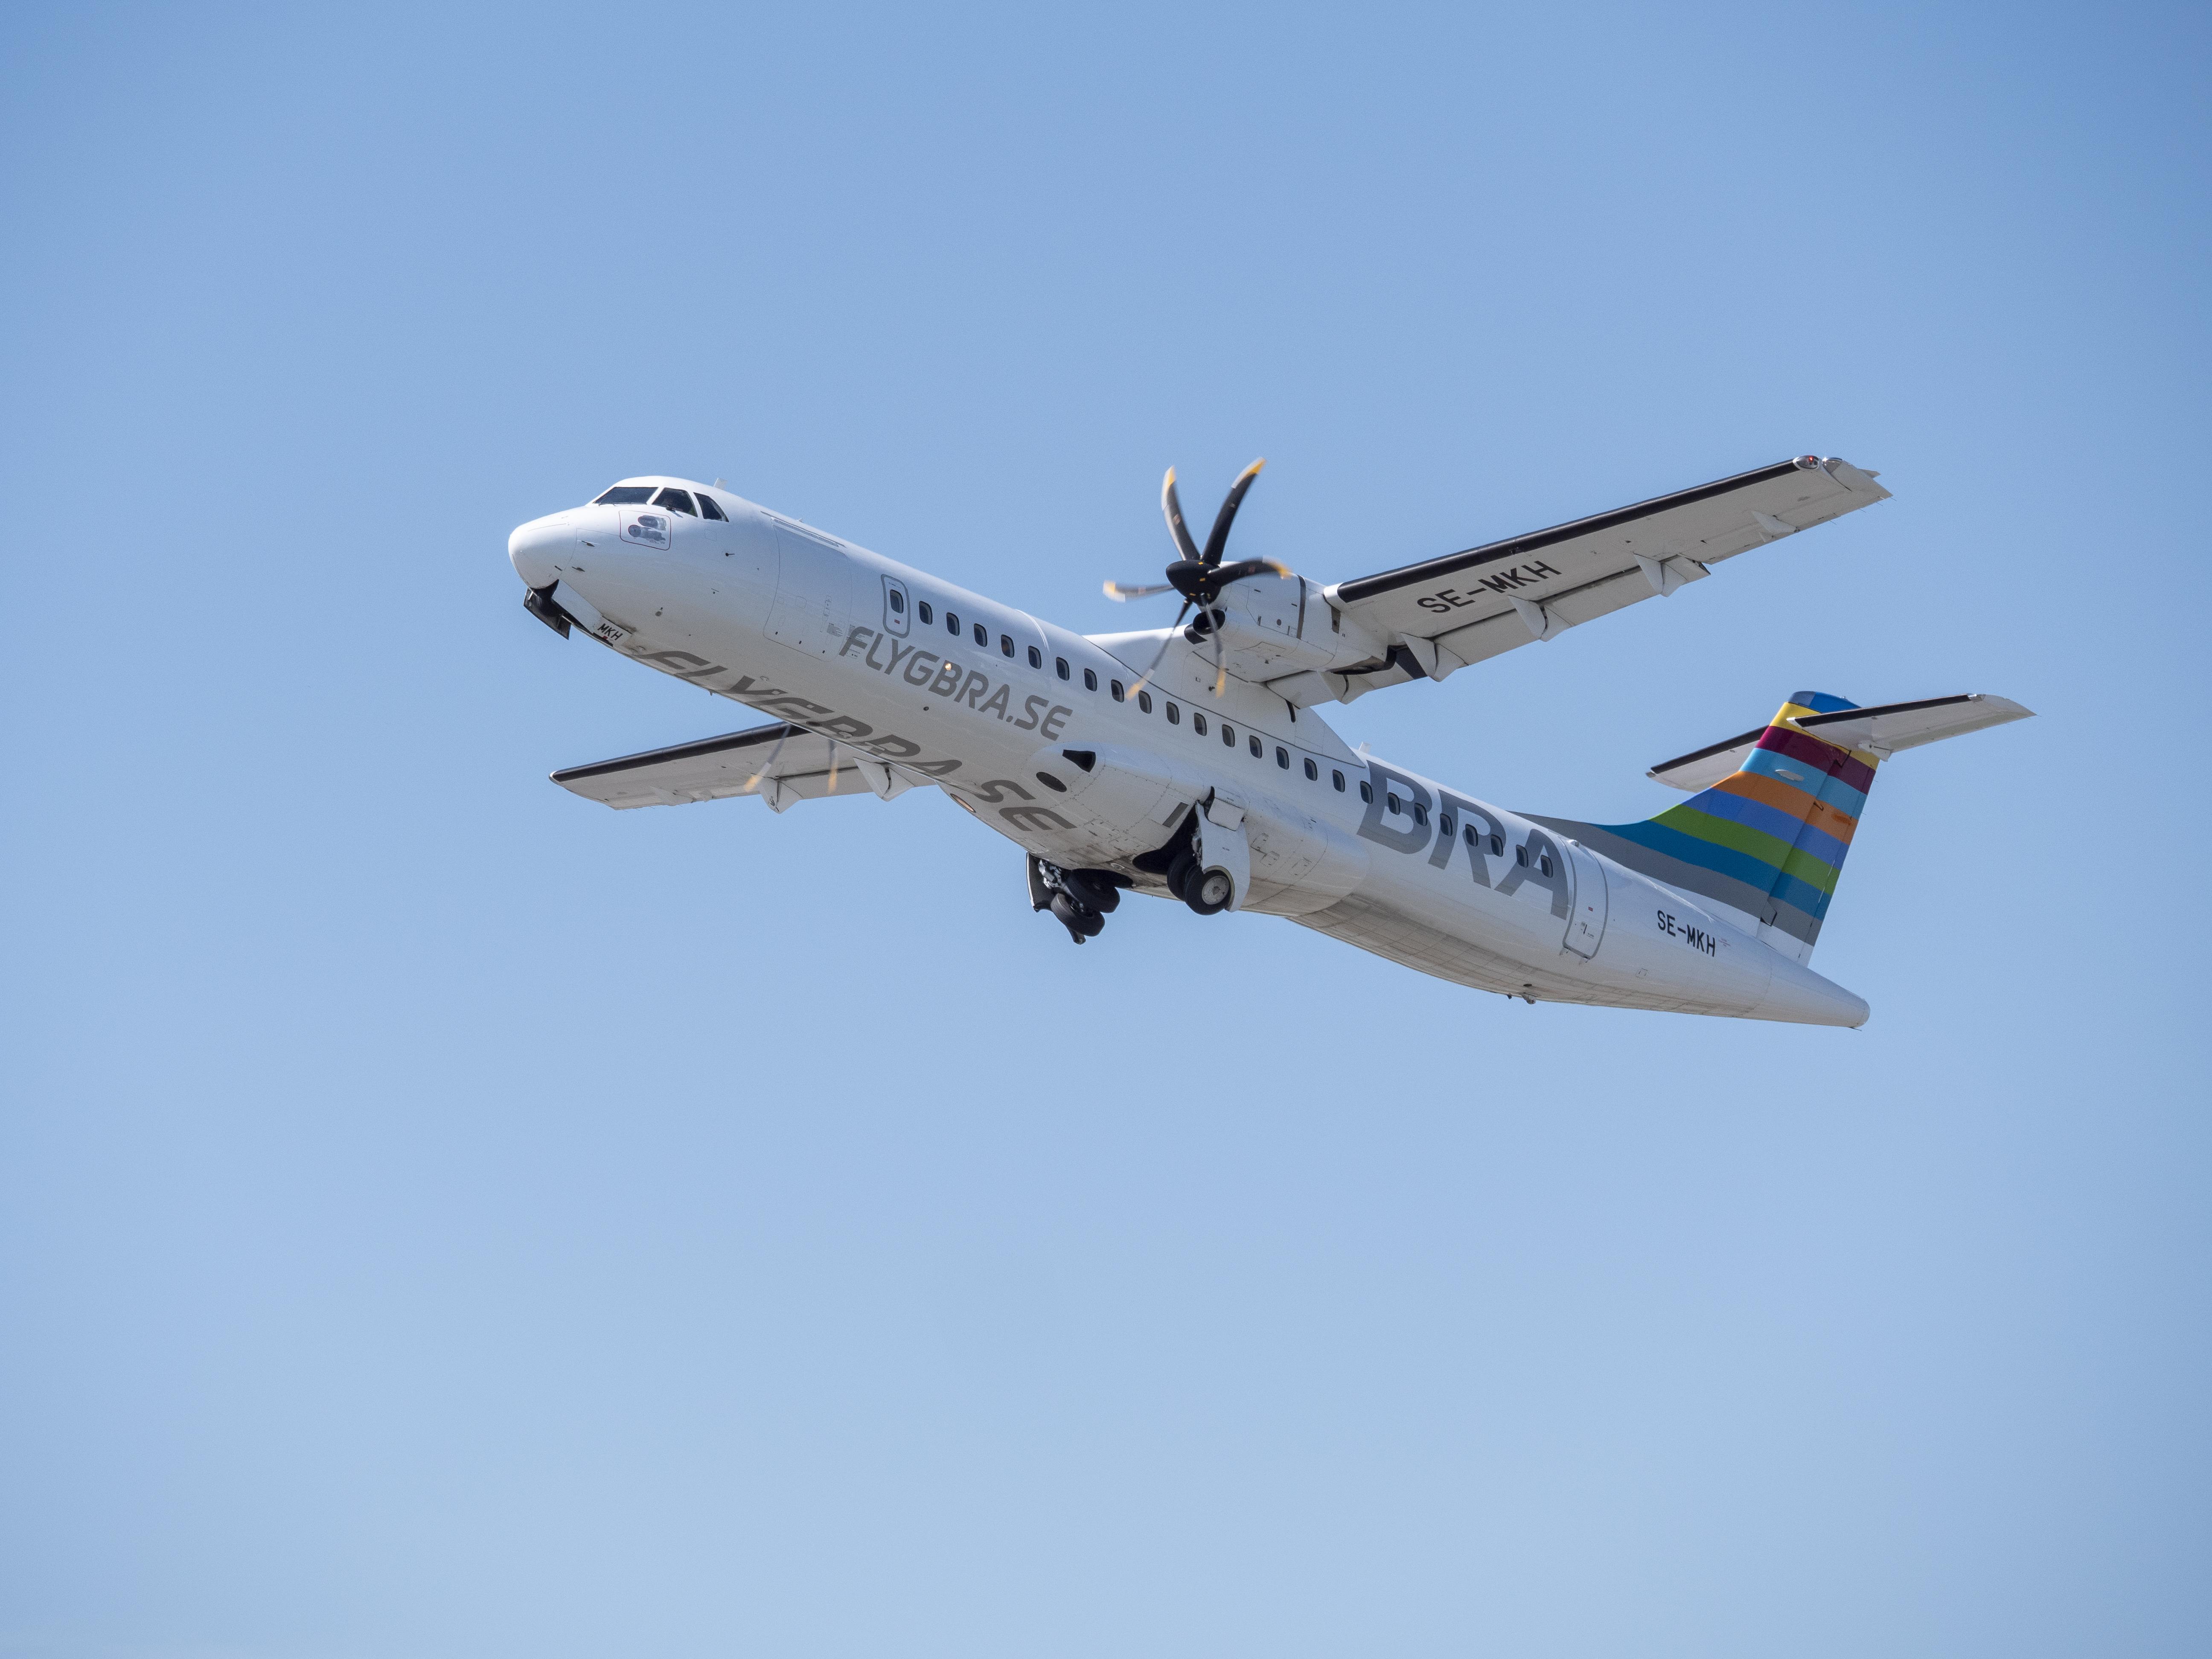 En ATR 72-600 fra det svenske regionale flyselskab BRA. Foto: BRA